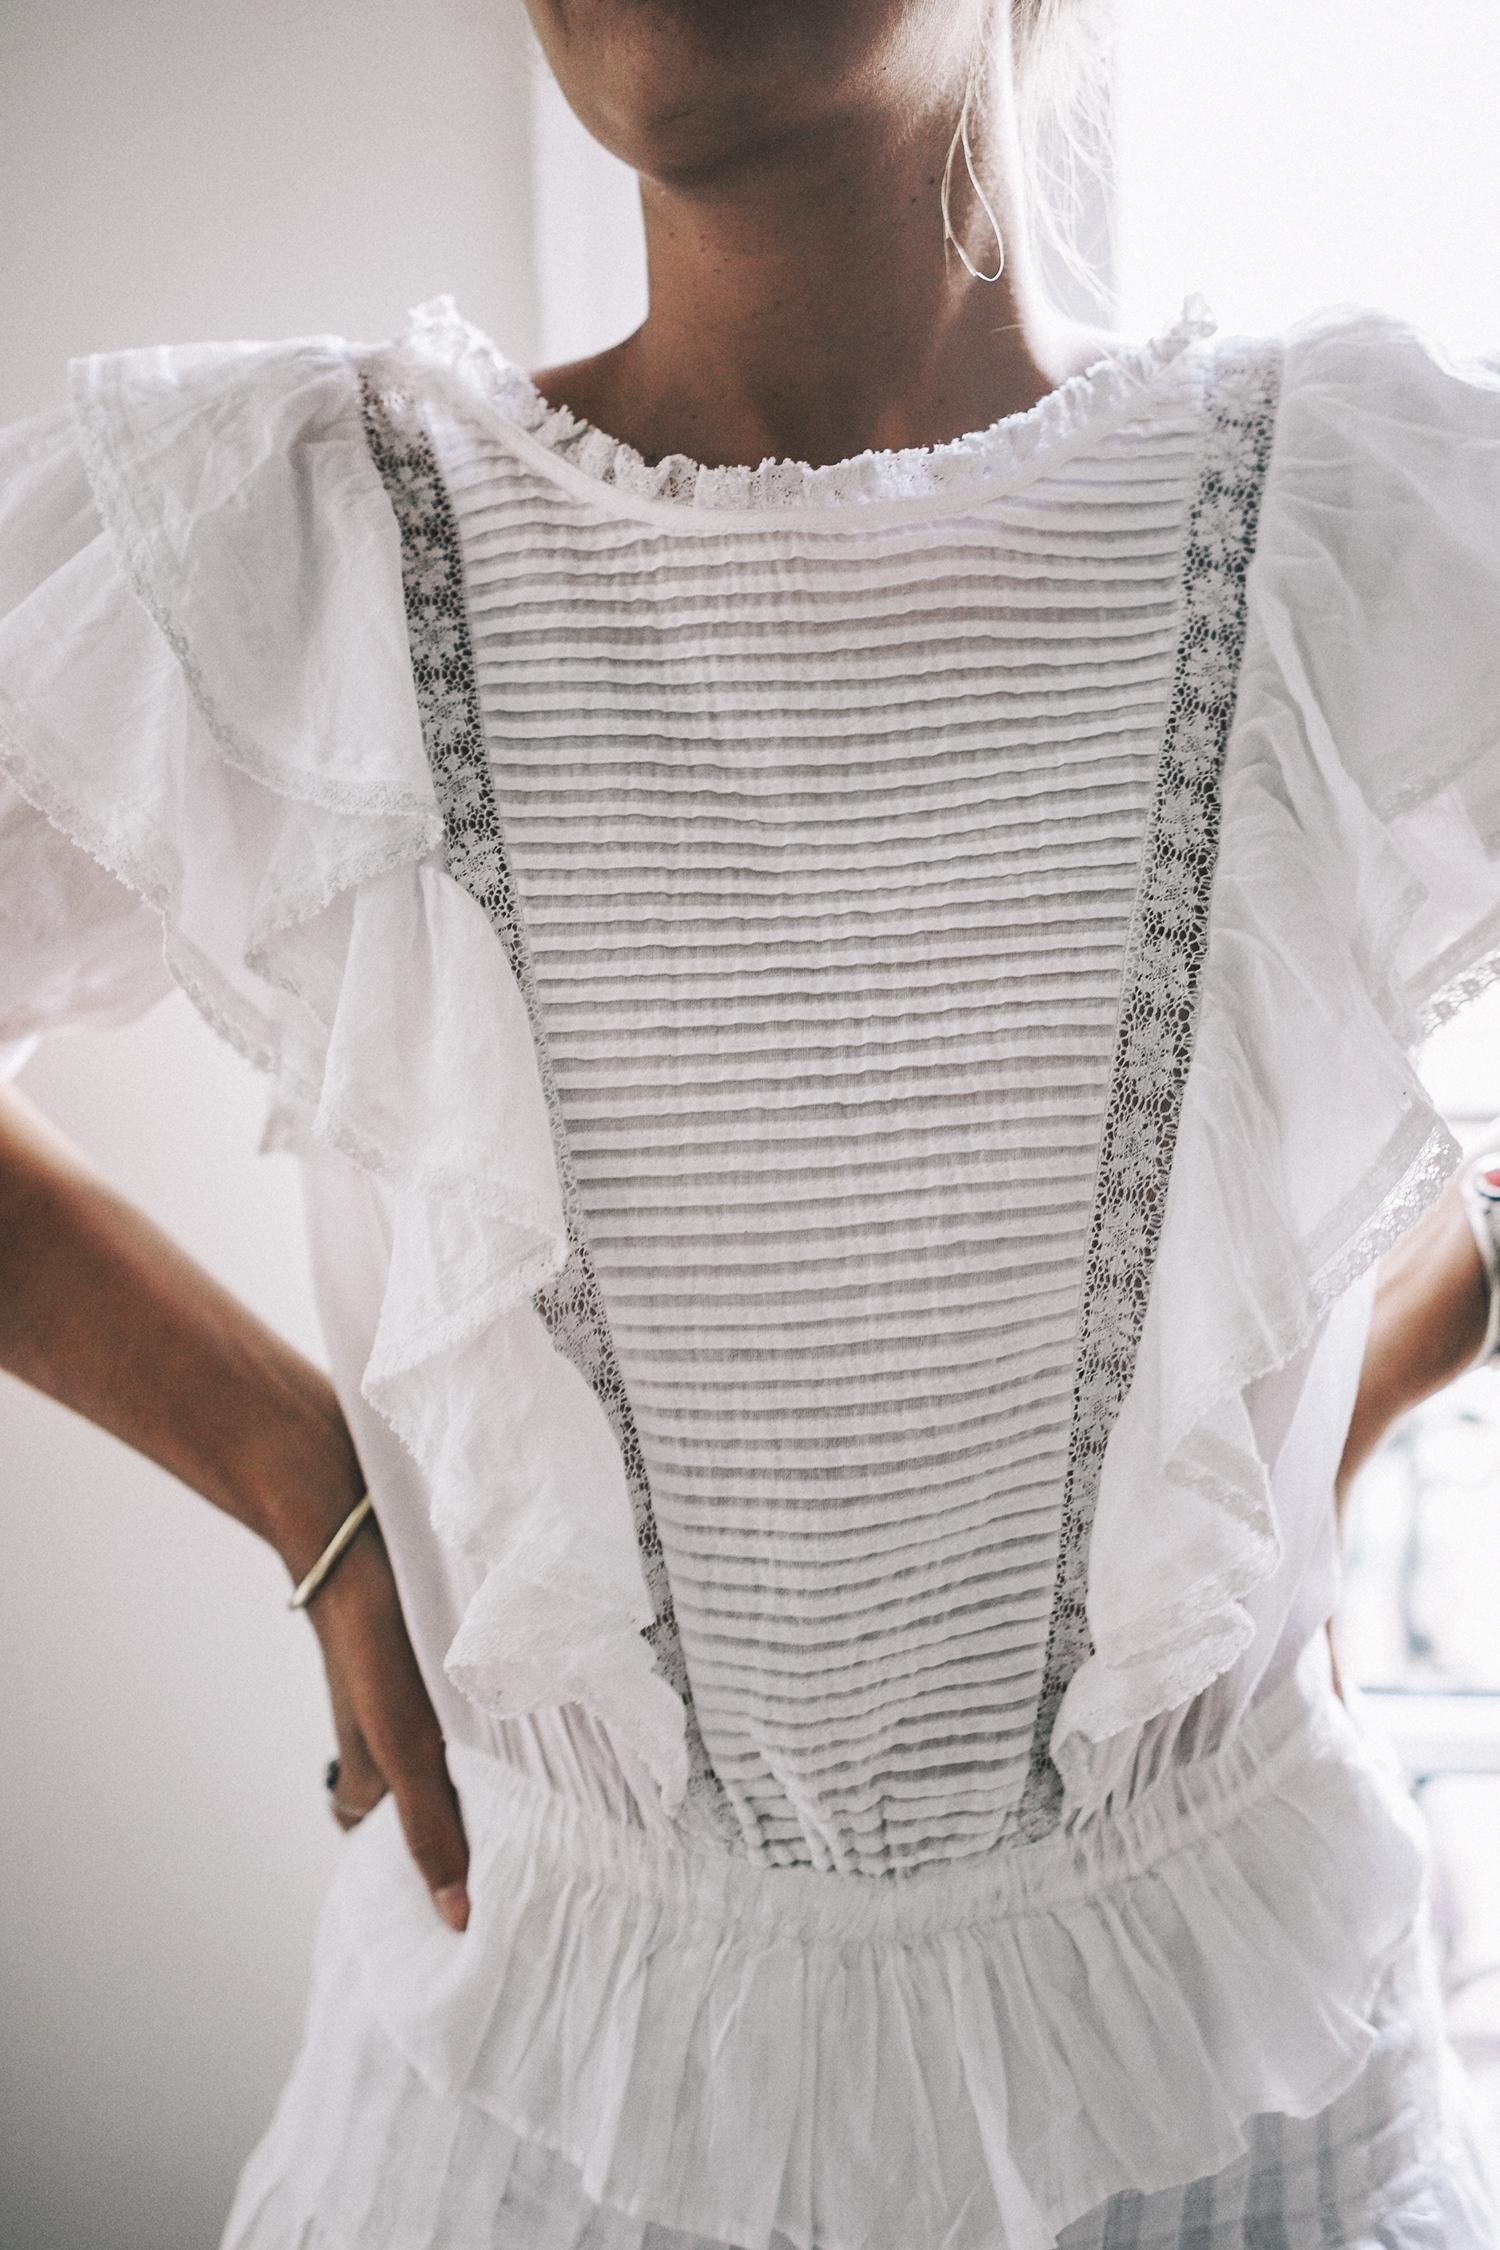 Home_Away-Isabel_Marant_Dress-Outfit-Paris-Collage_Vintage-49